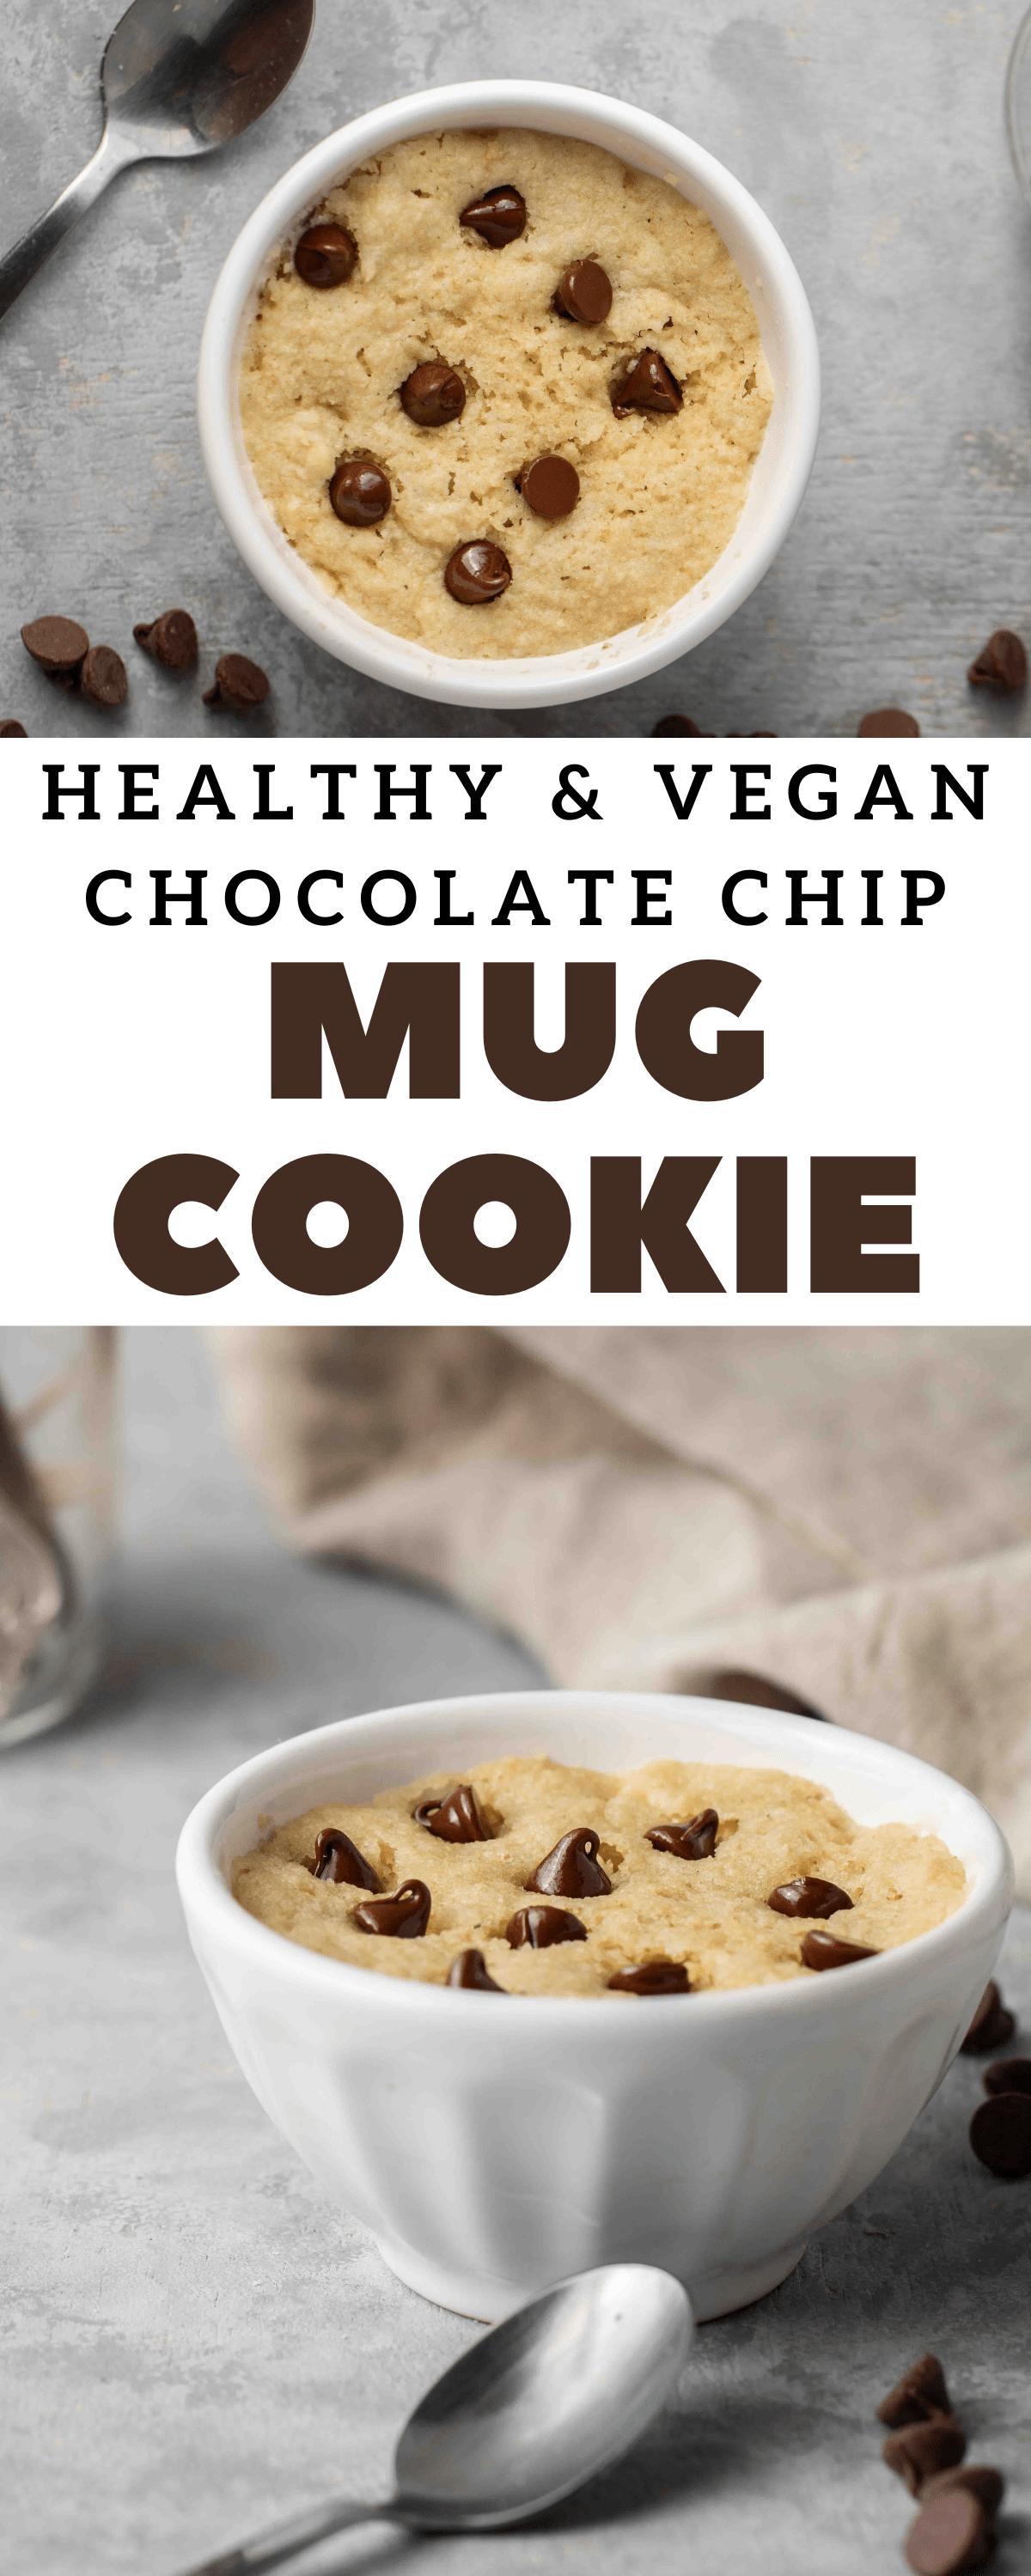 Healthy Chocolate Chip Vegan Mug Cookie Lifestyle Of A Foodie